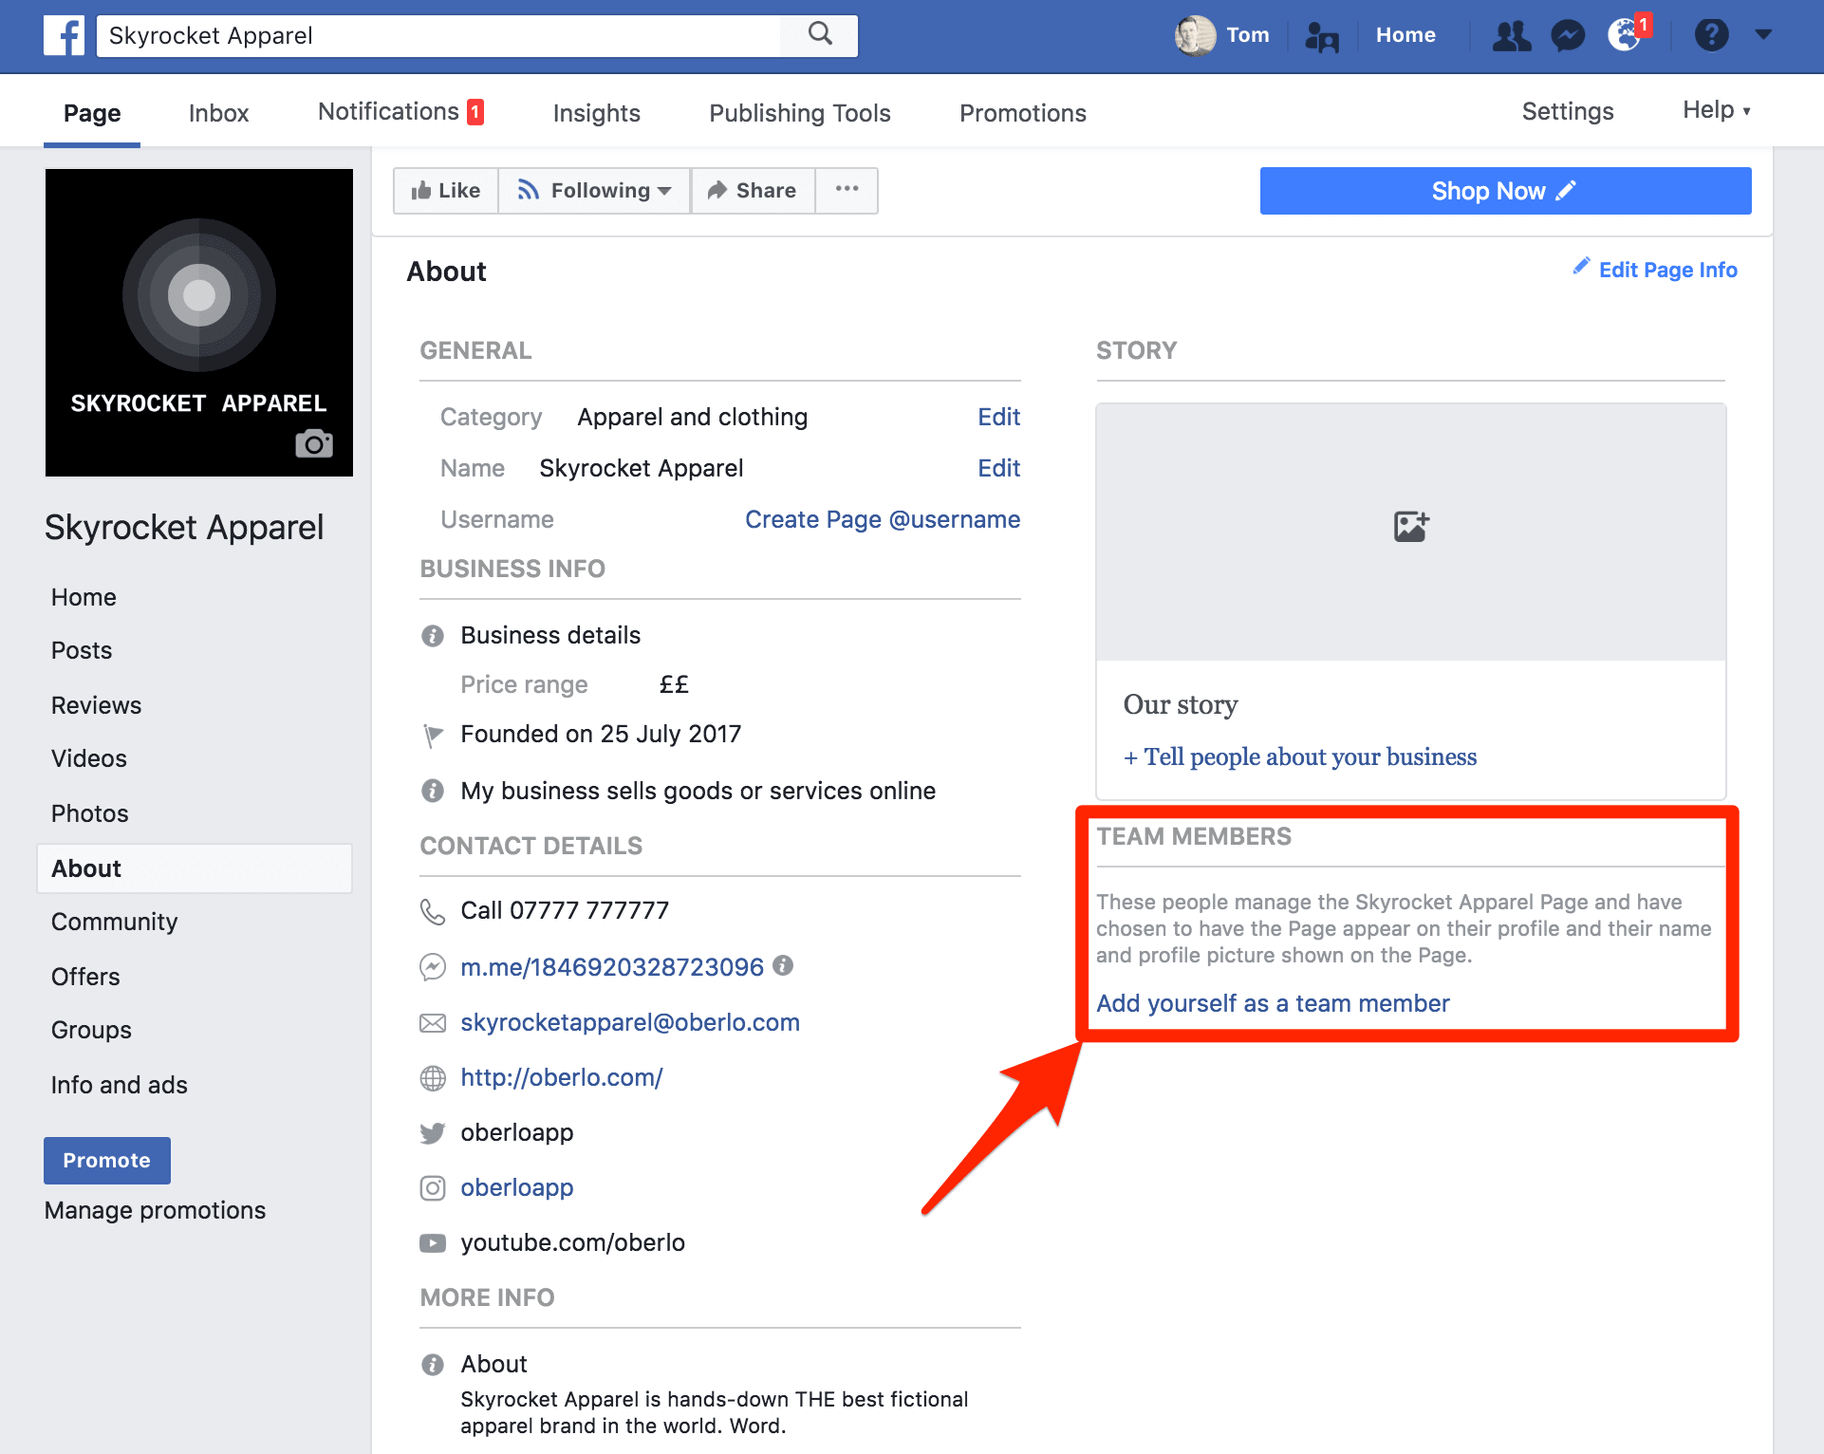 Thong tin ca nhan va doanh nghiep tren Facebook